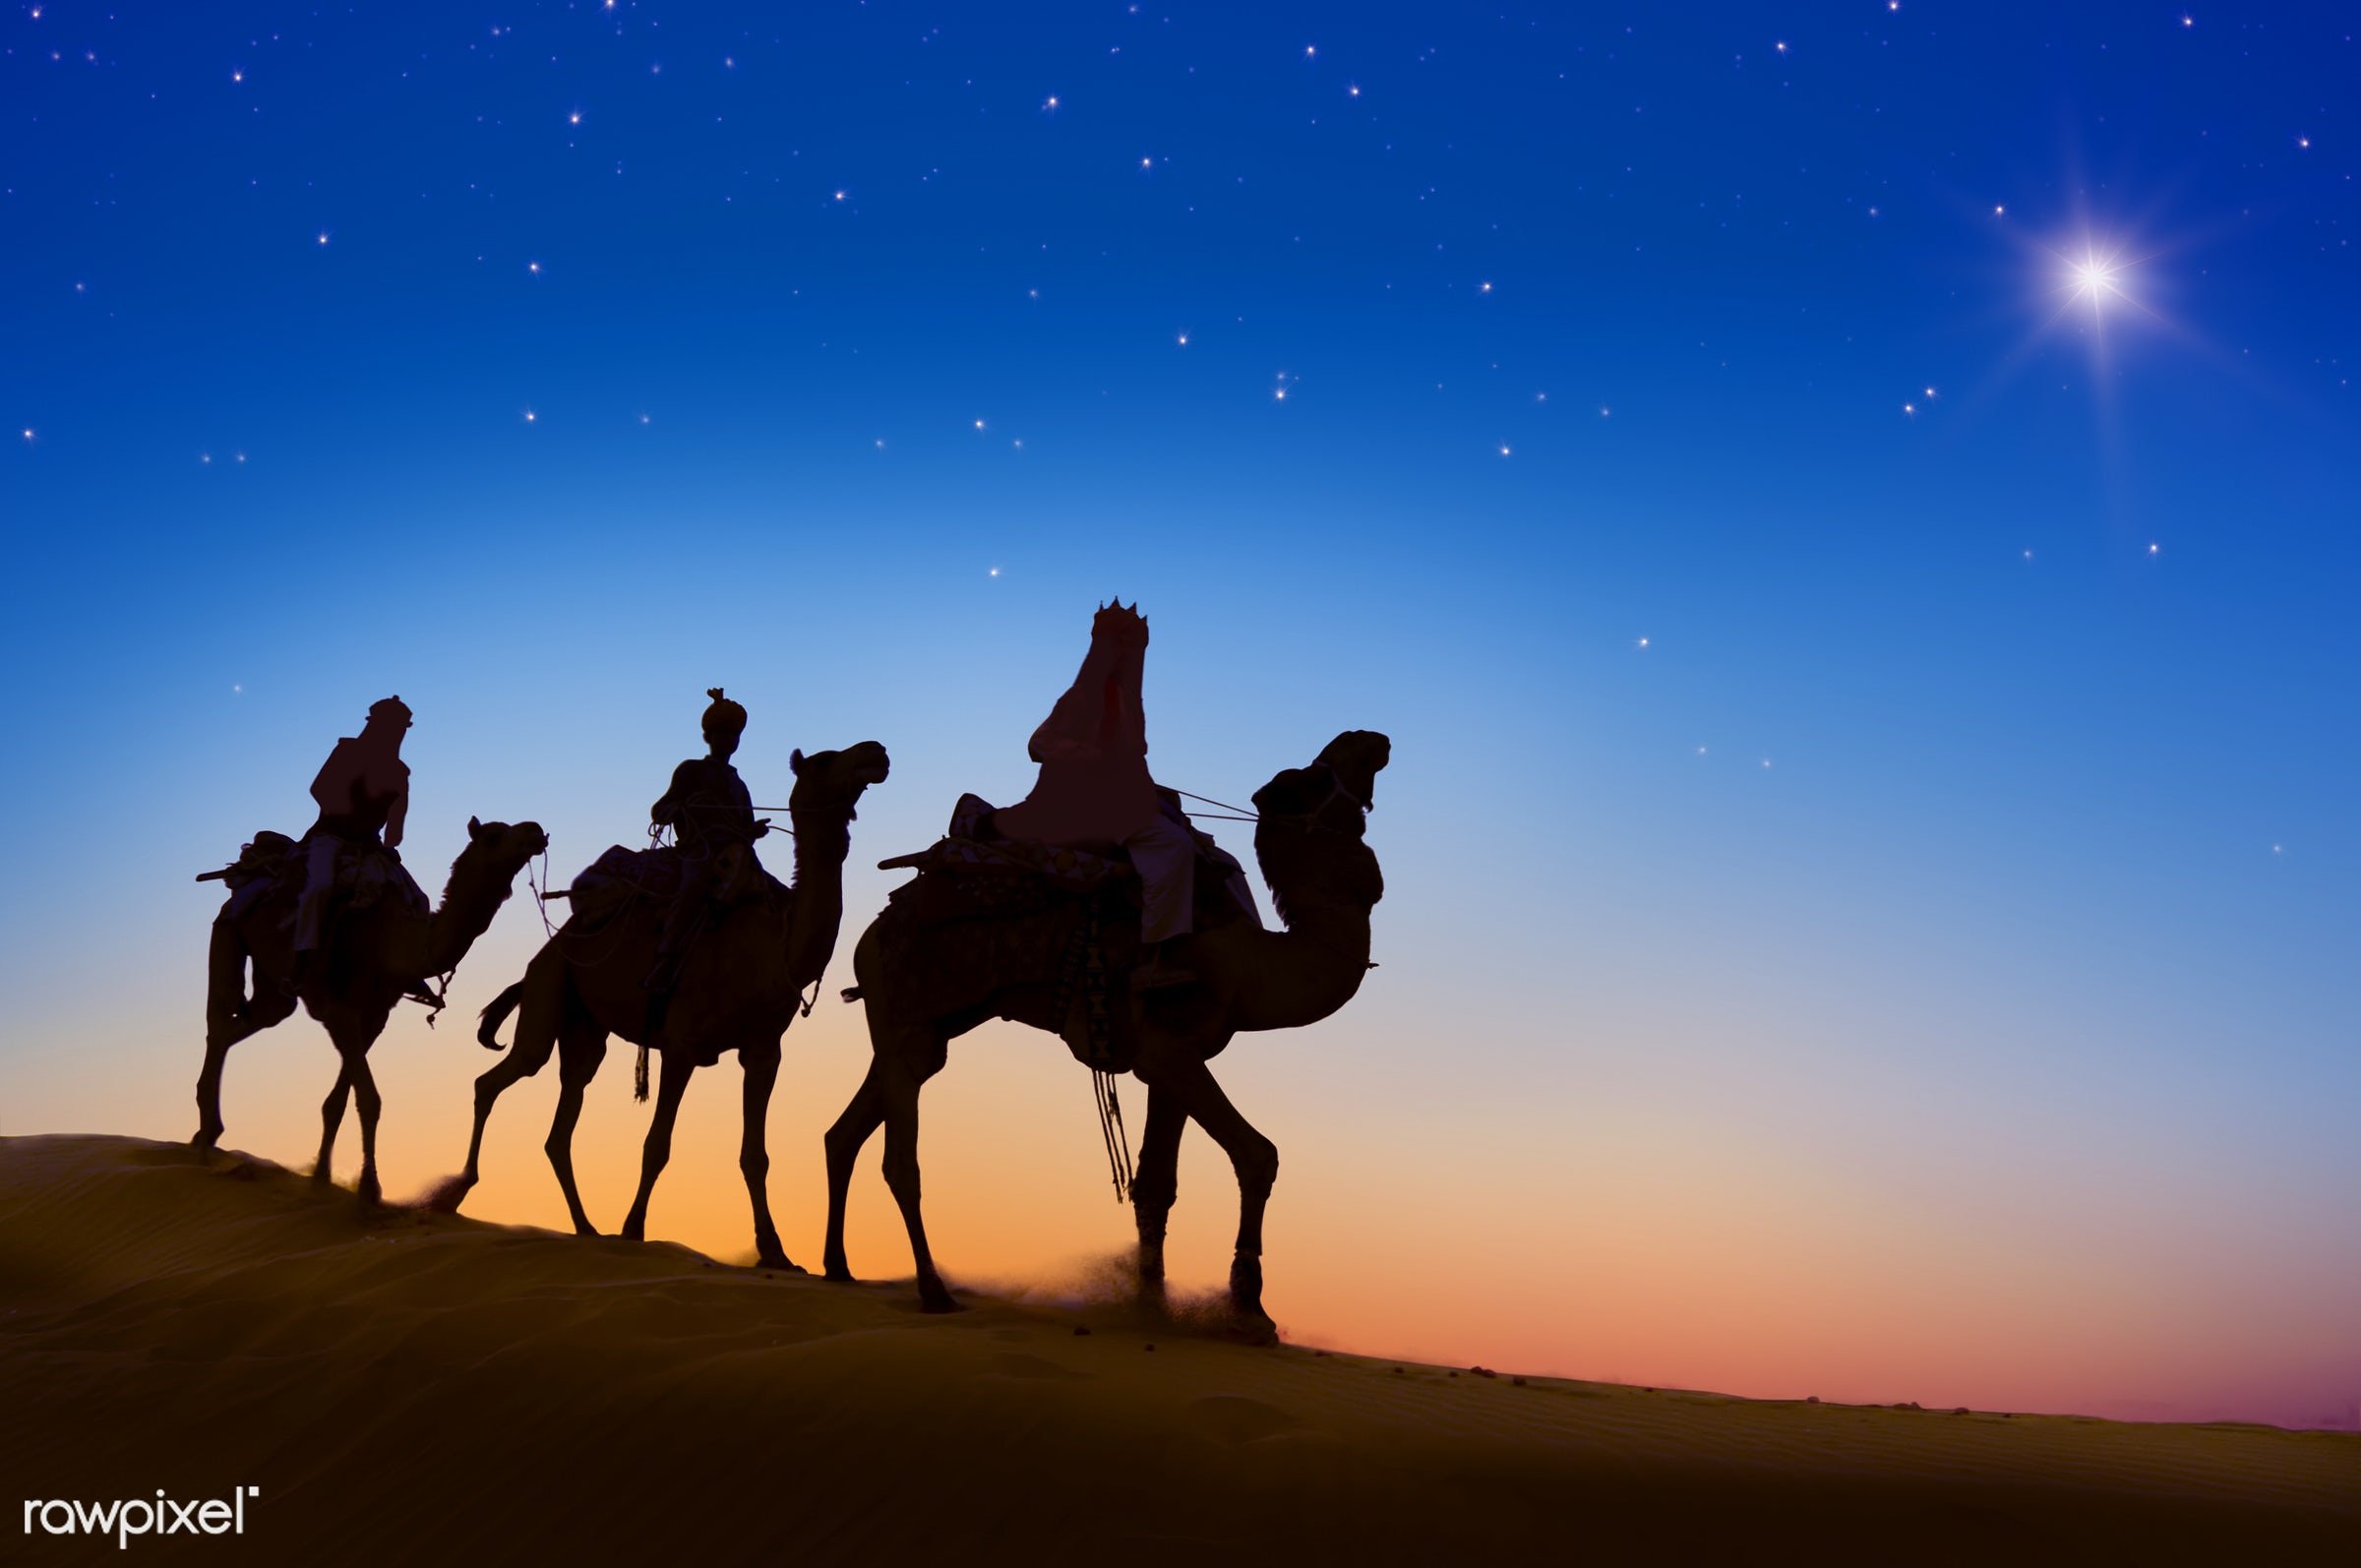 Three Wise Men - nativity, 3 wise men, back lit, bethlehem - israel, camel, caravan, concepts, desert, destination, dusk,...